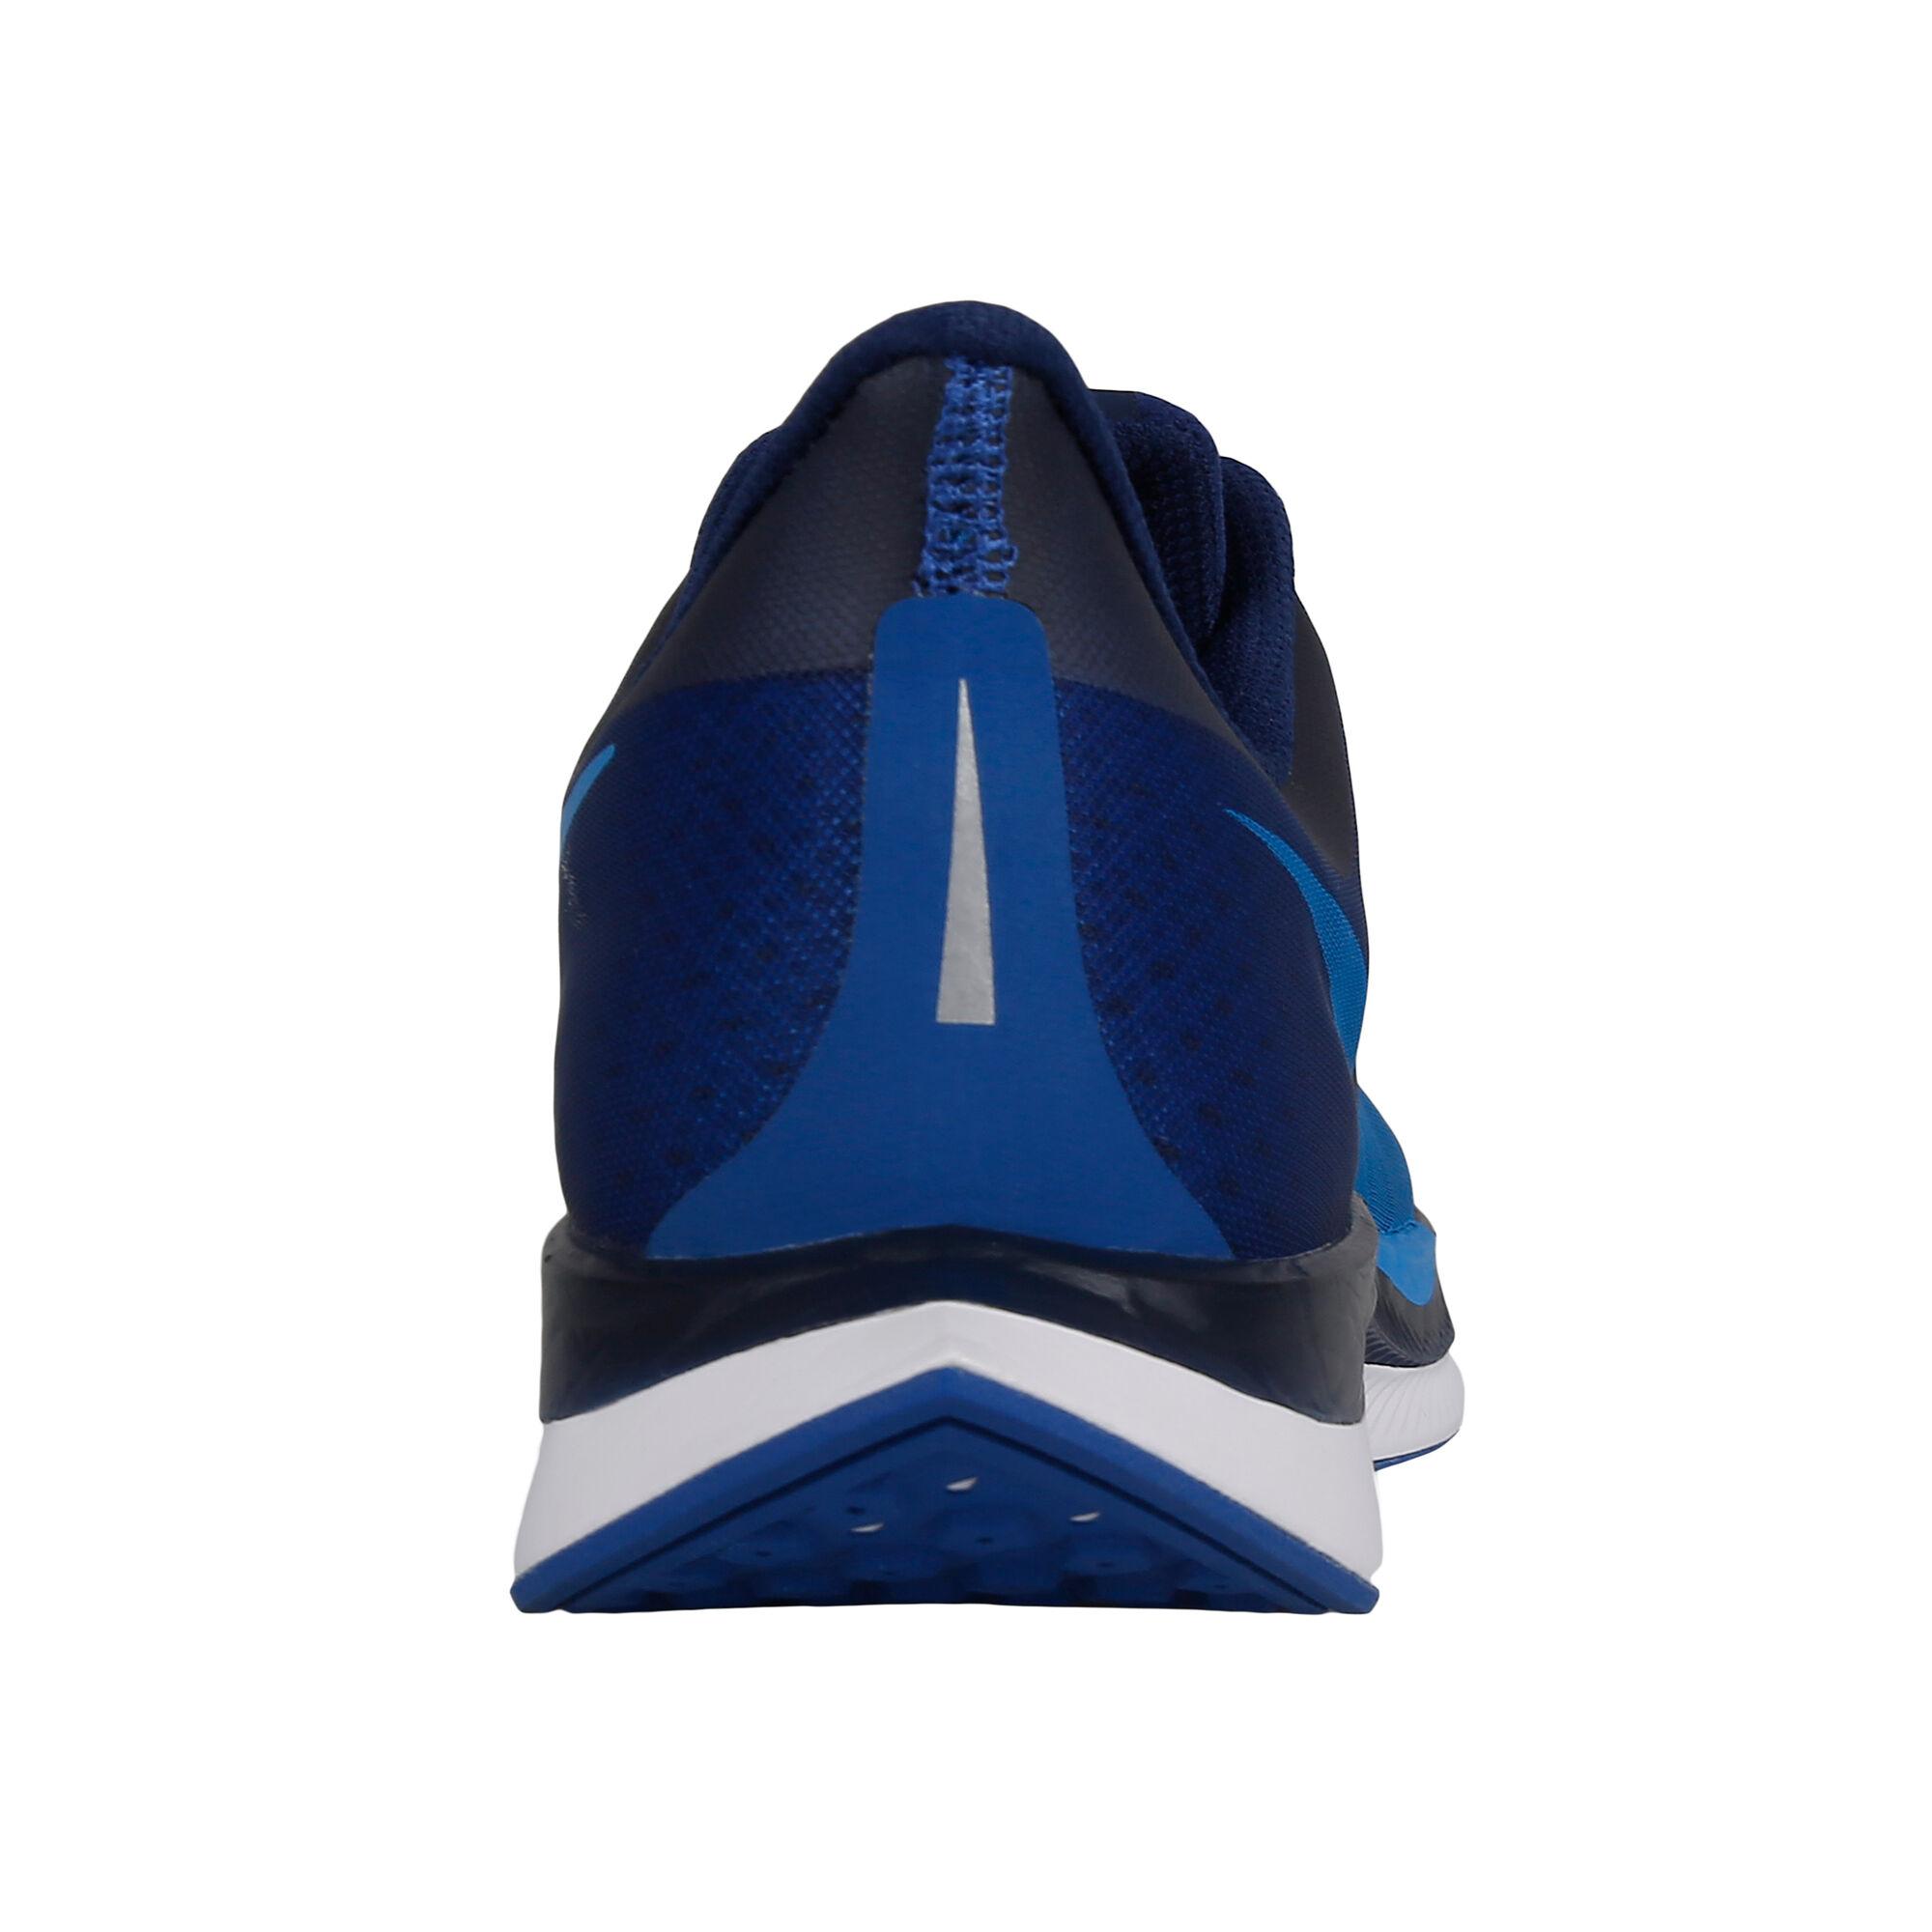 2201bc33c1172 Nike · Nike · Nike · Nike · Nike · Nike · Nike · Nike · Nike. Zoom Pegasus  35 Turbo ...